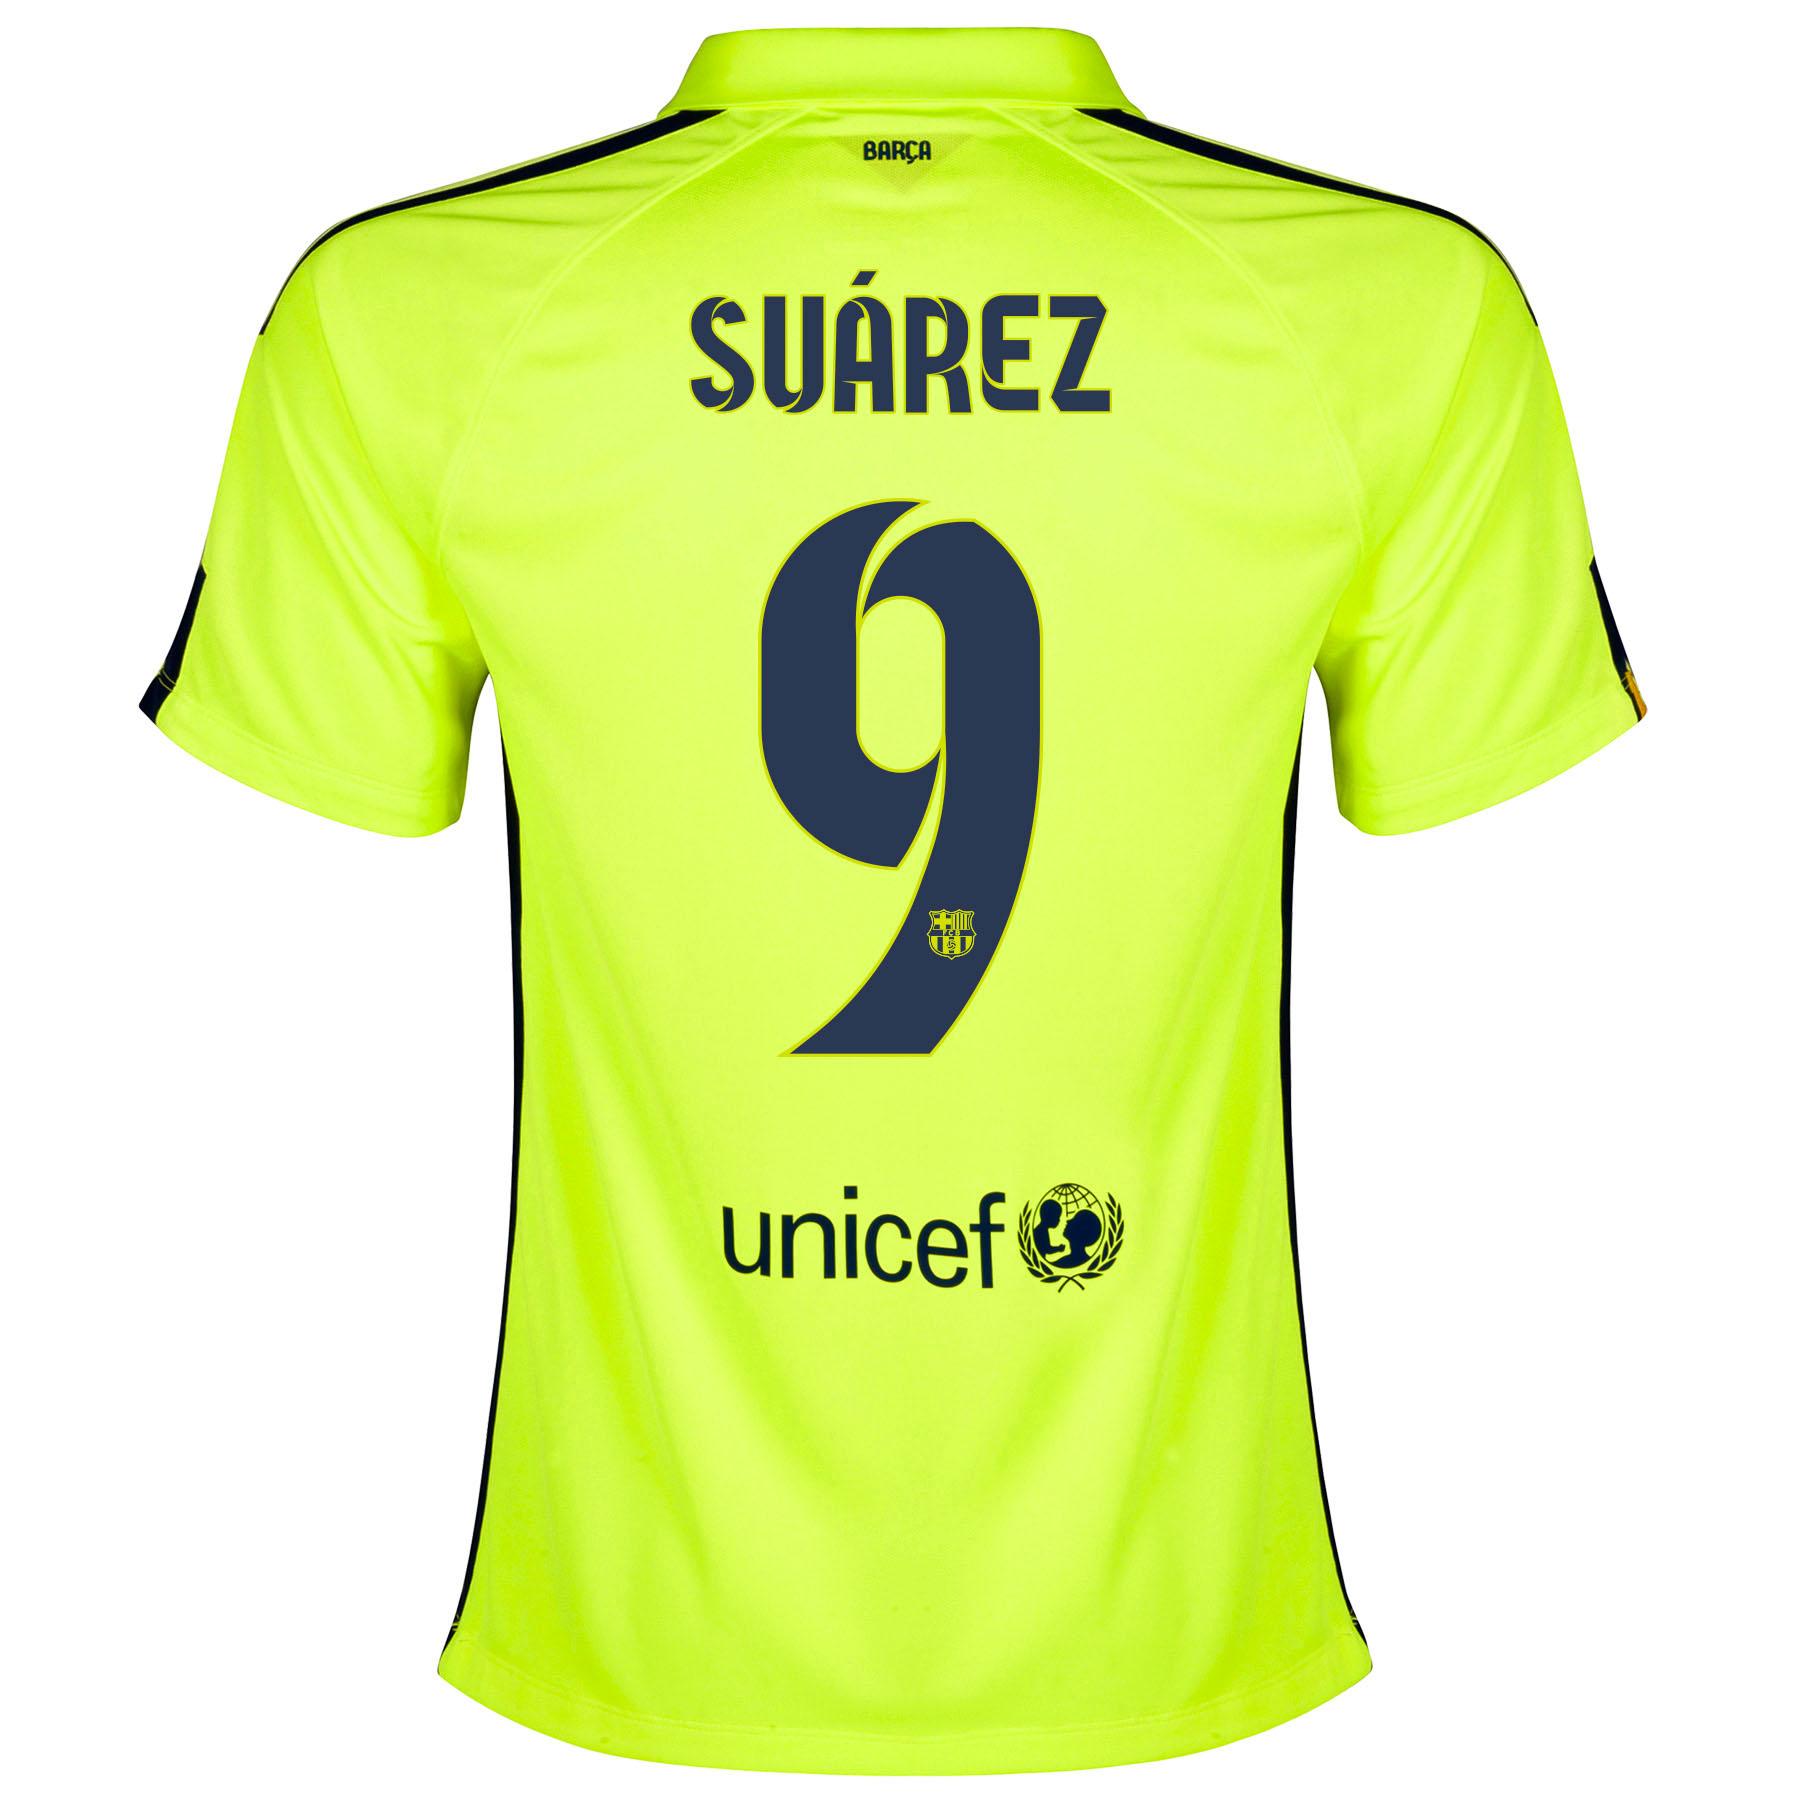 Barcelona Third Shirt 2014/15 - Womens Yellow with Suárez 9 printing